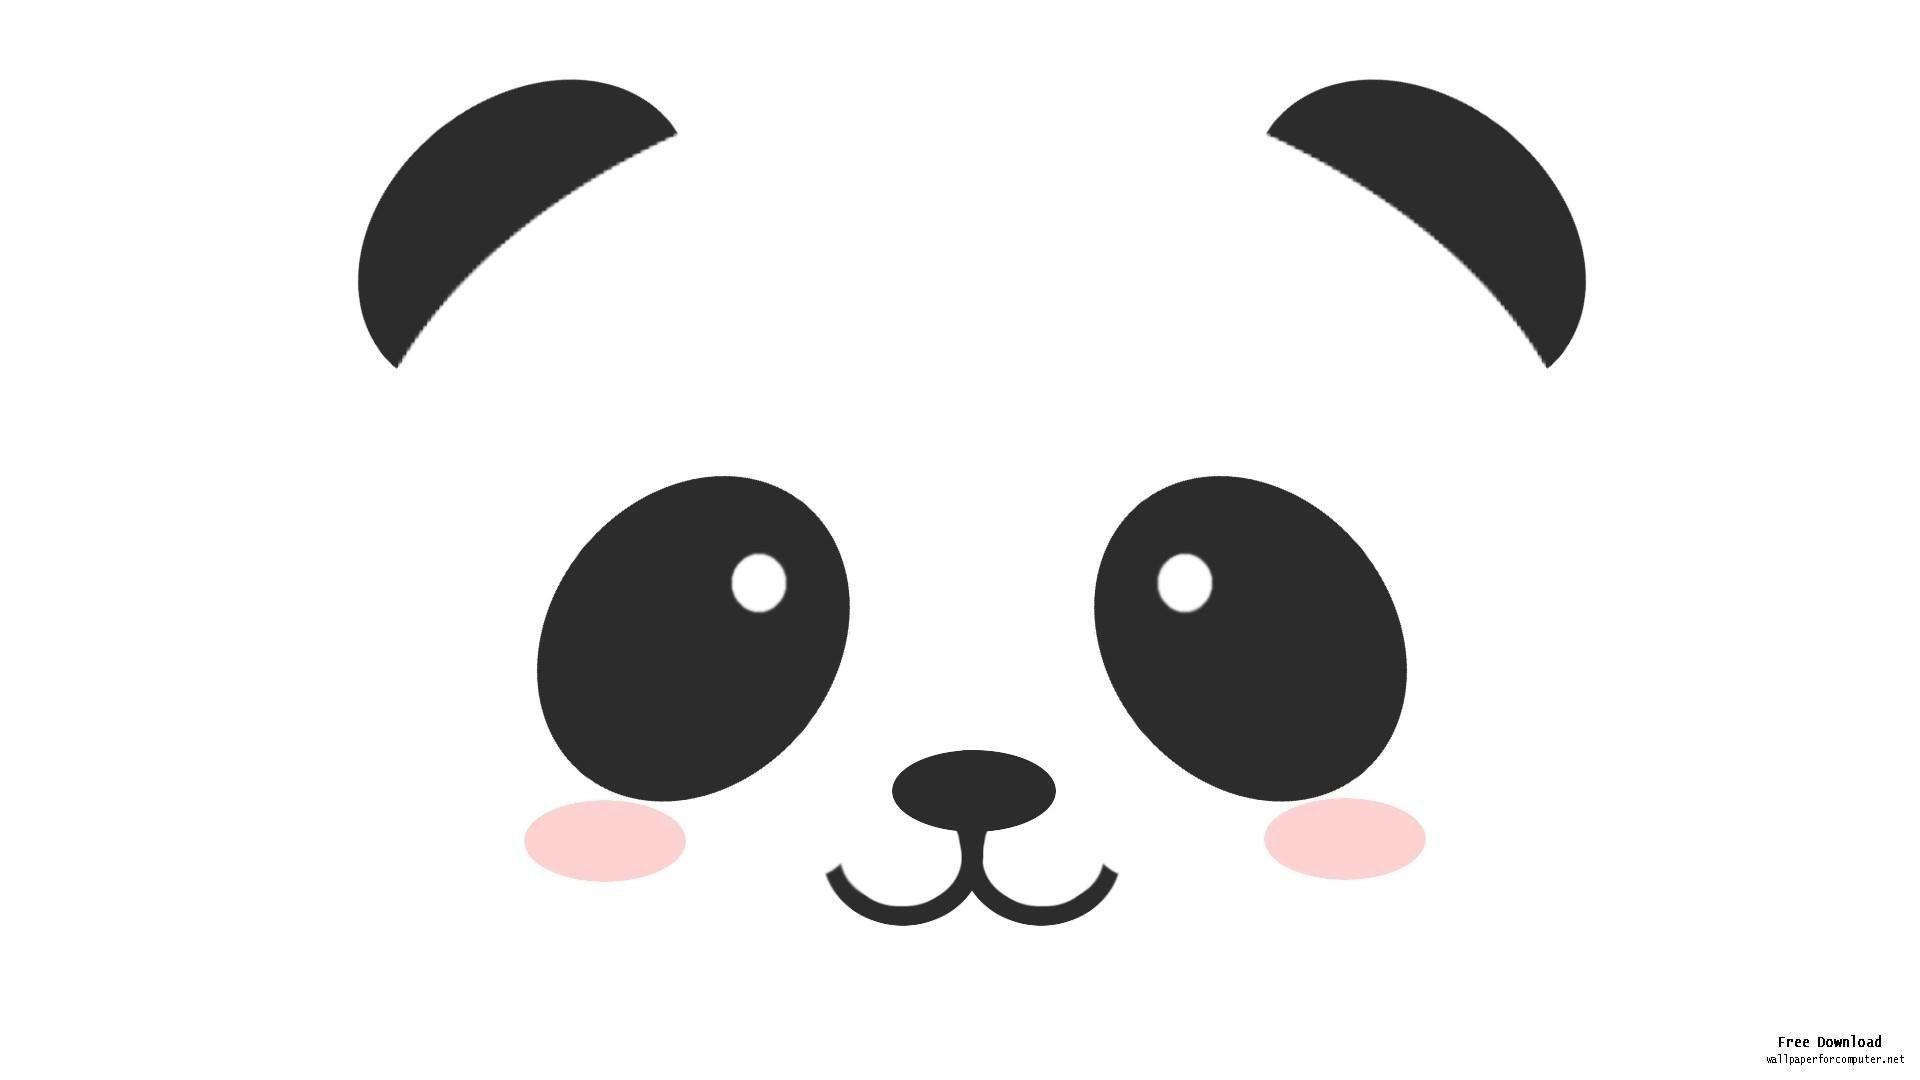 Anime Panda Wallpaper HD Resolution with High Definition Wallpaper  Resolution px 34.97 KB Anime Red